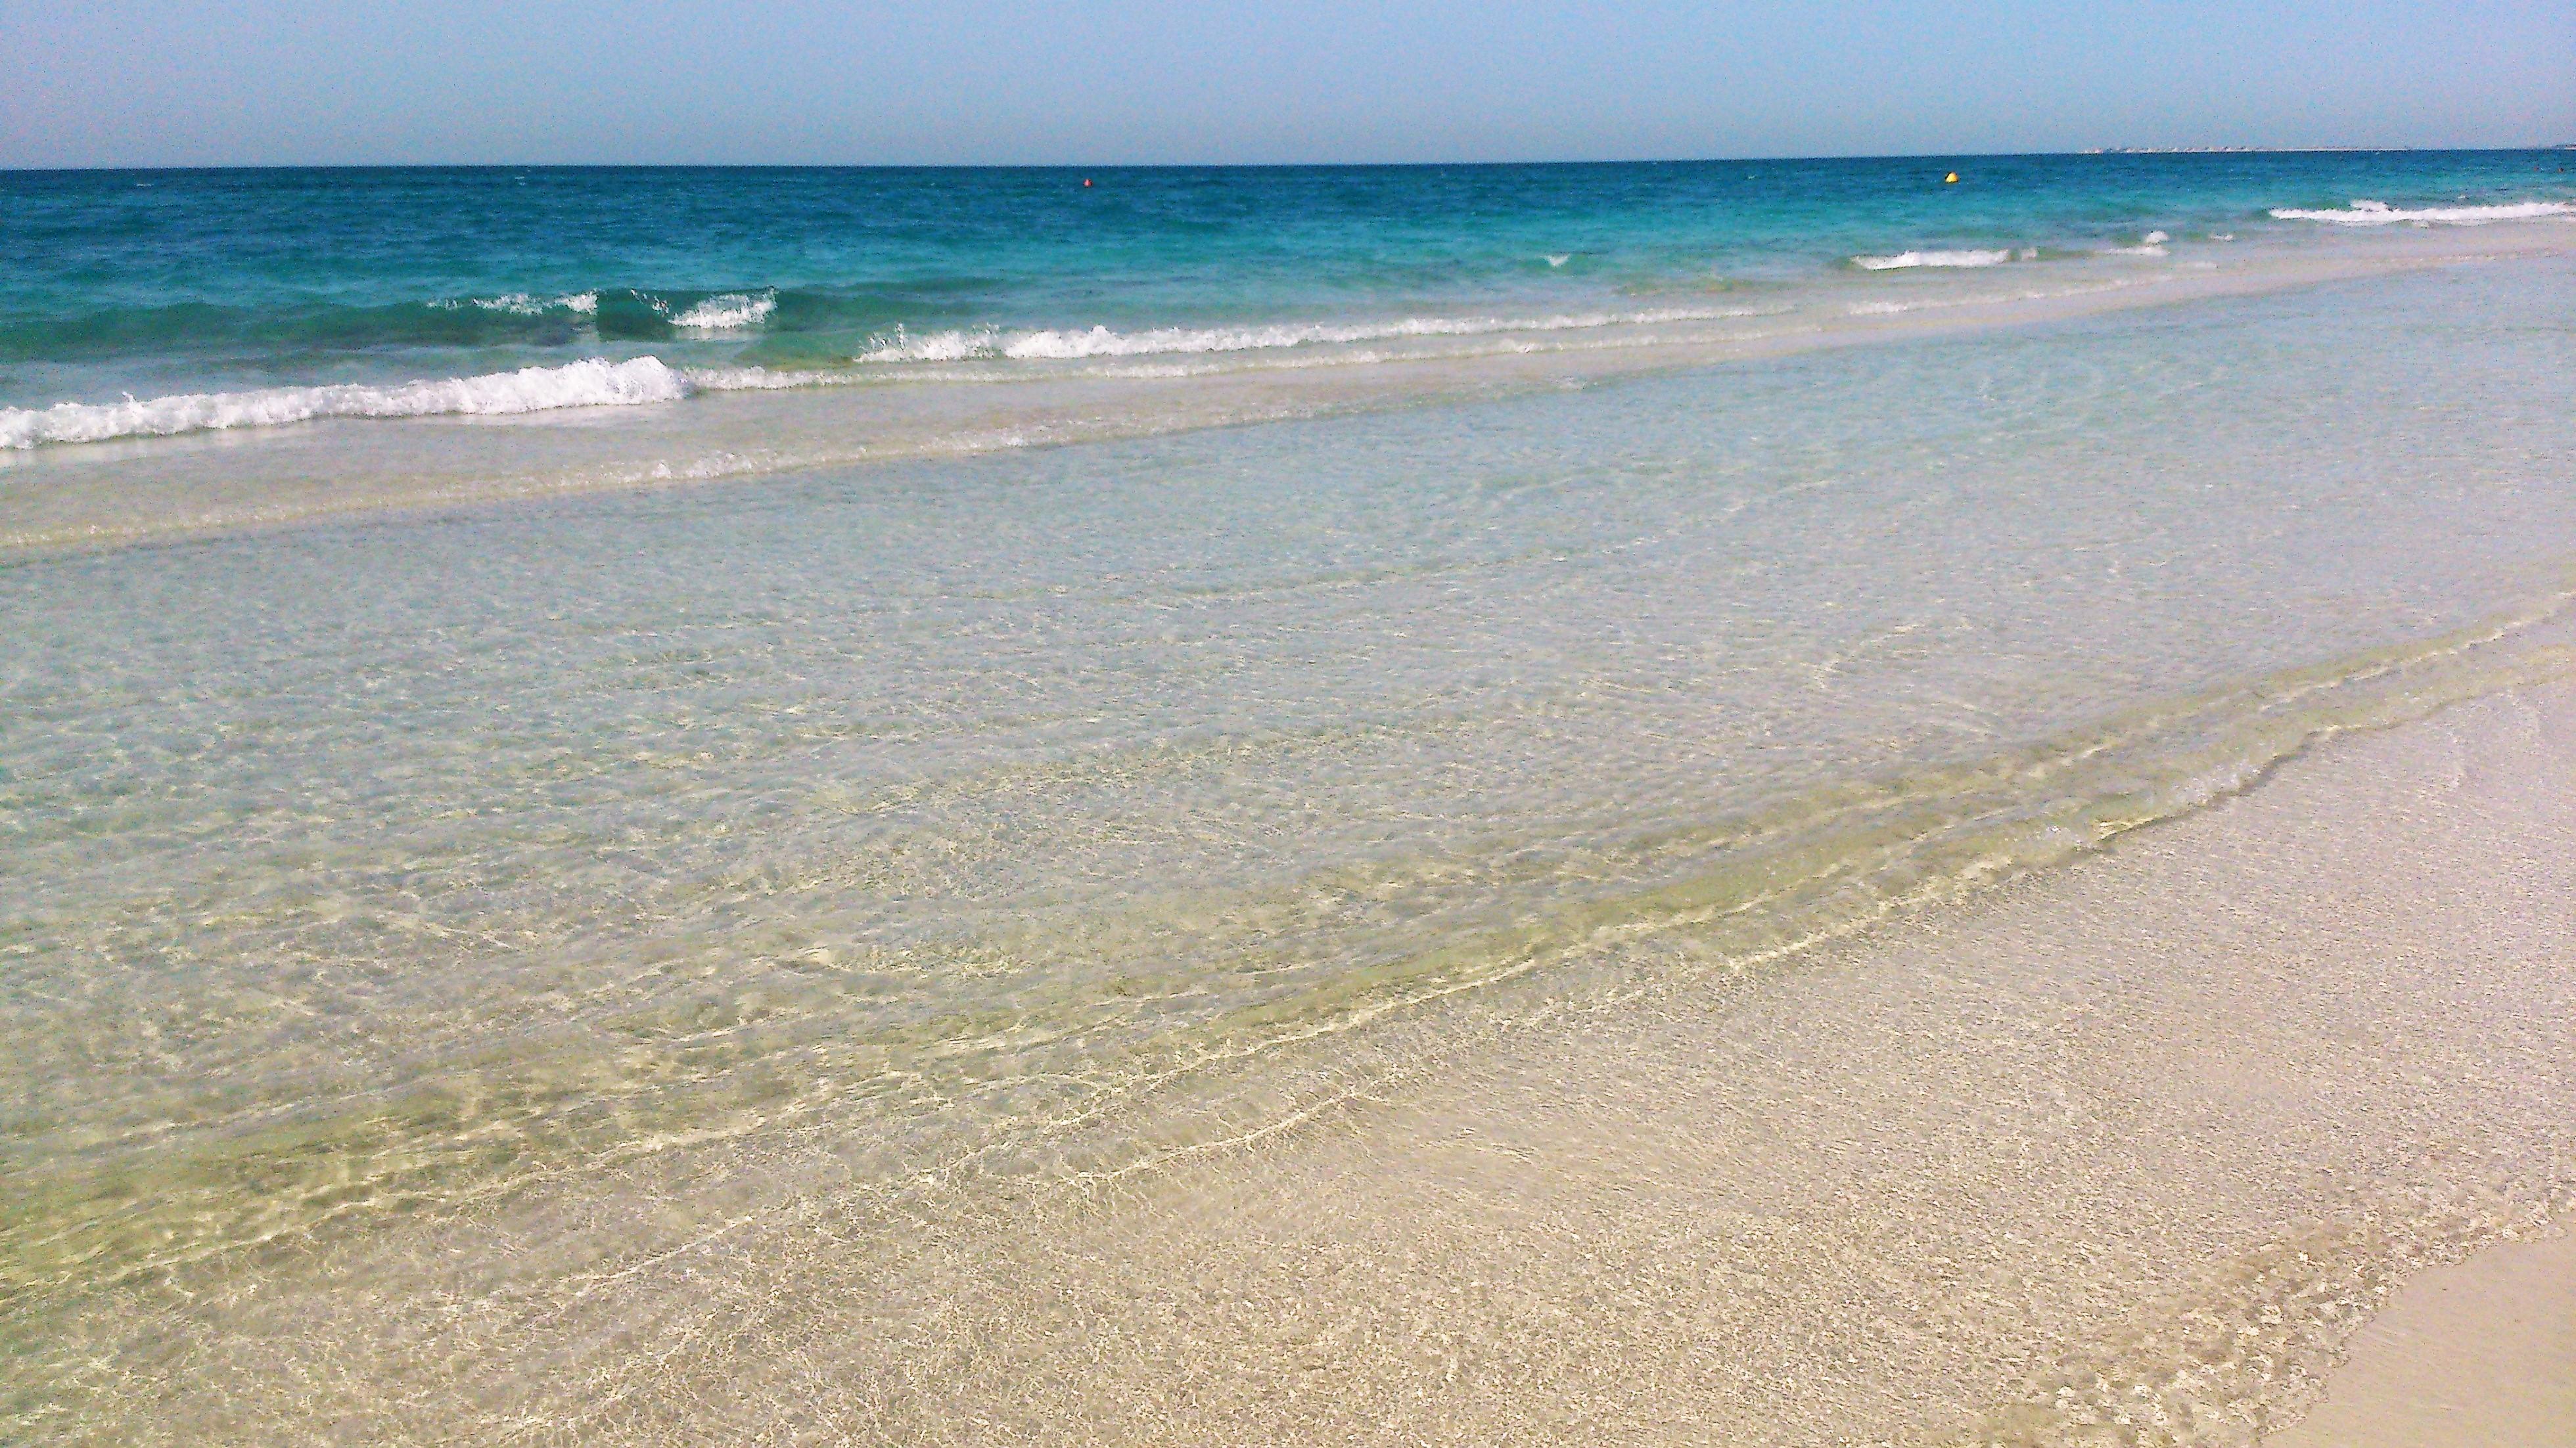 cristal-clear-water-at-saadiyat-beach